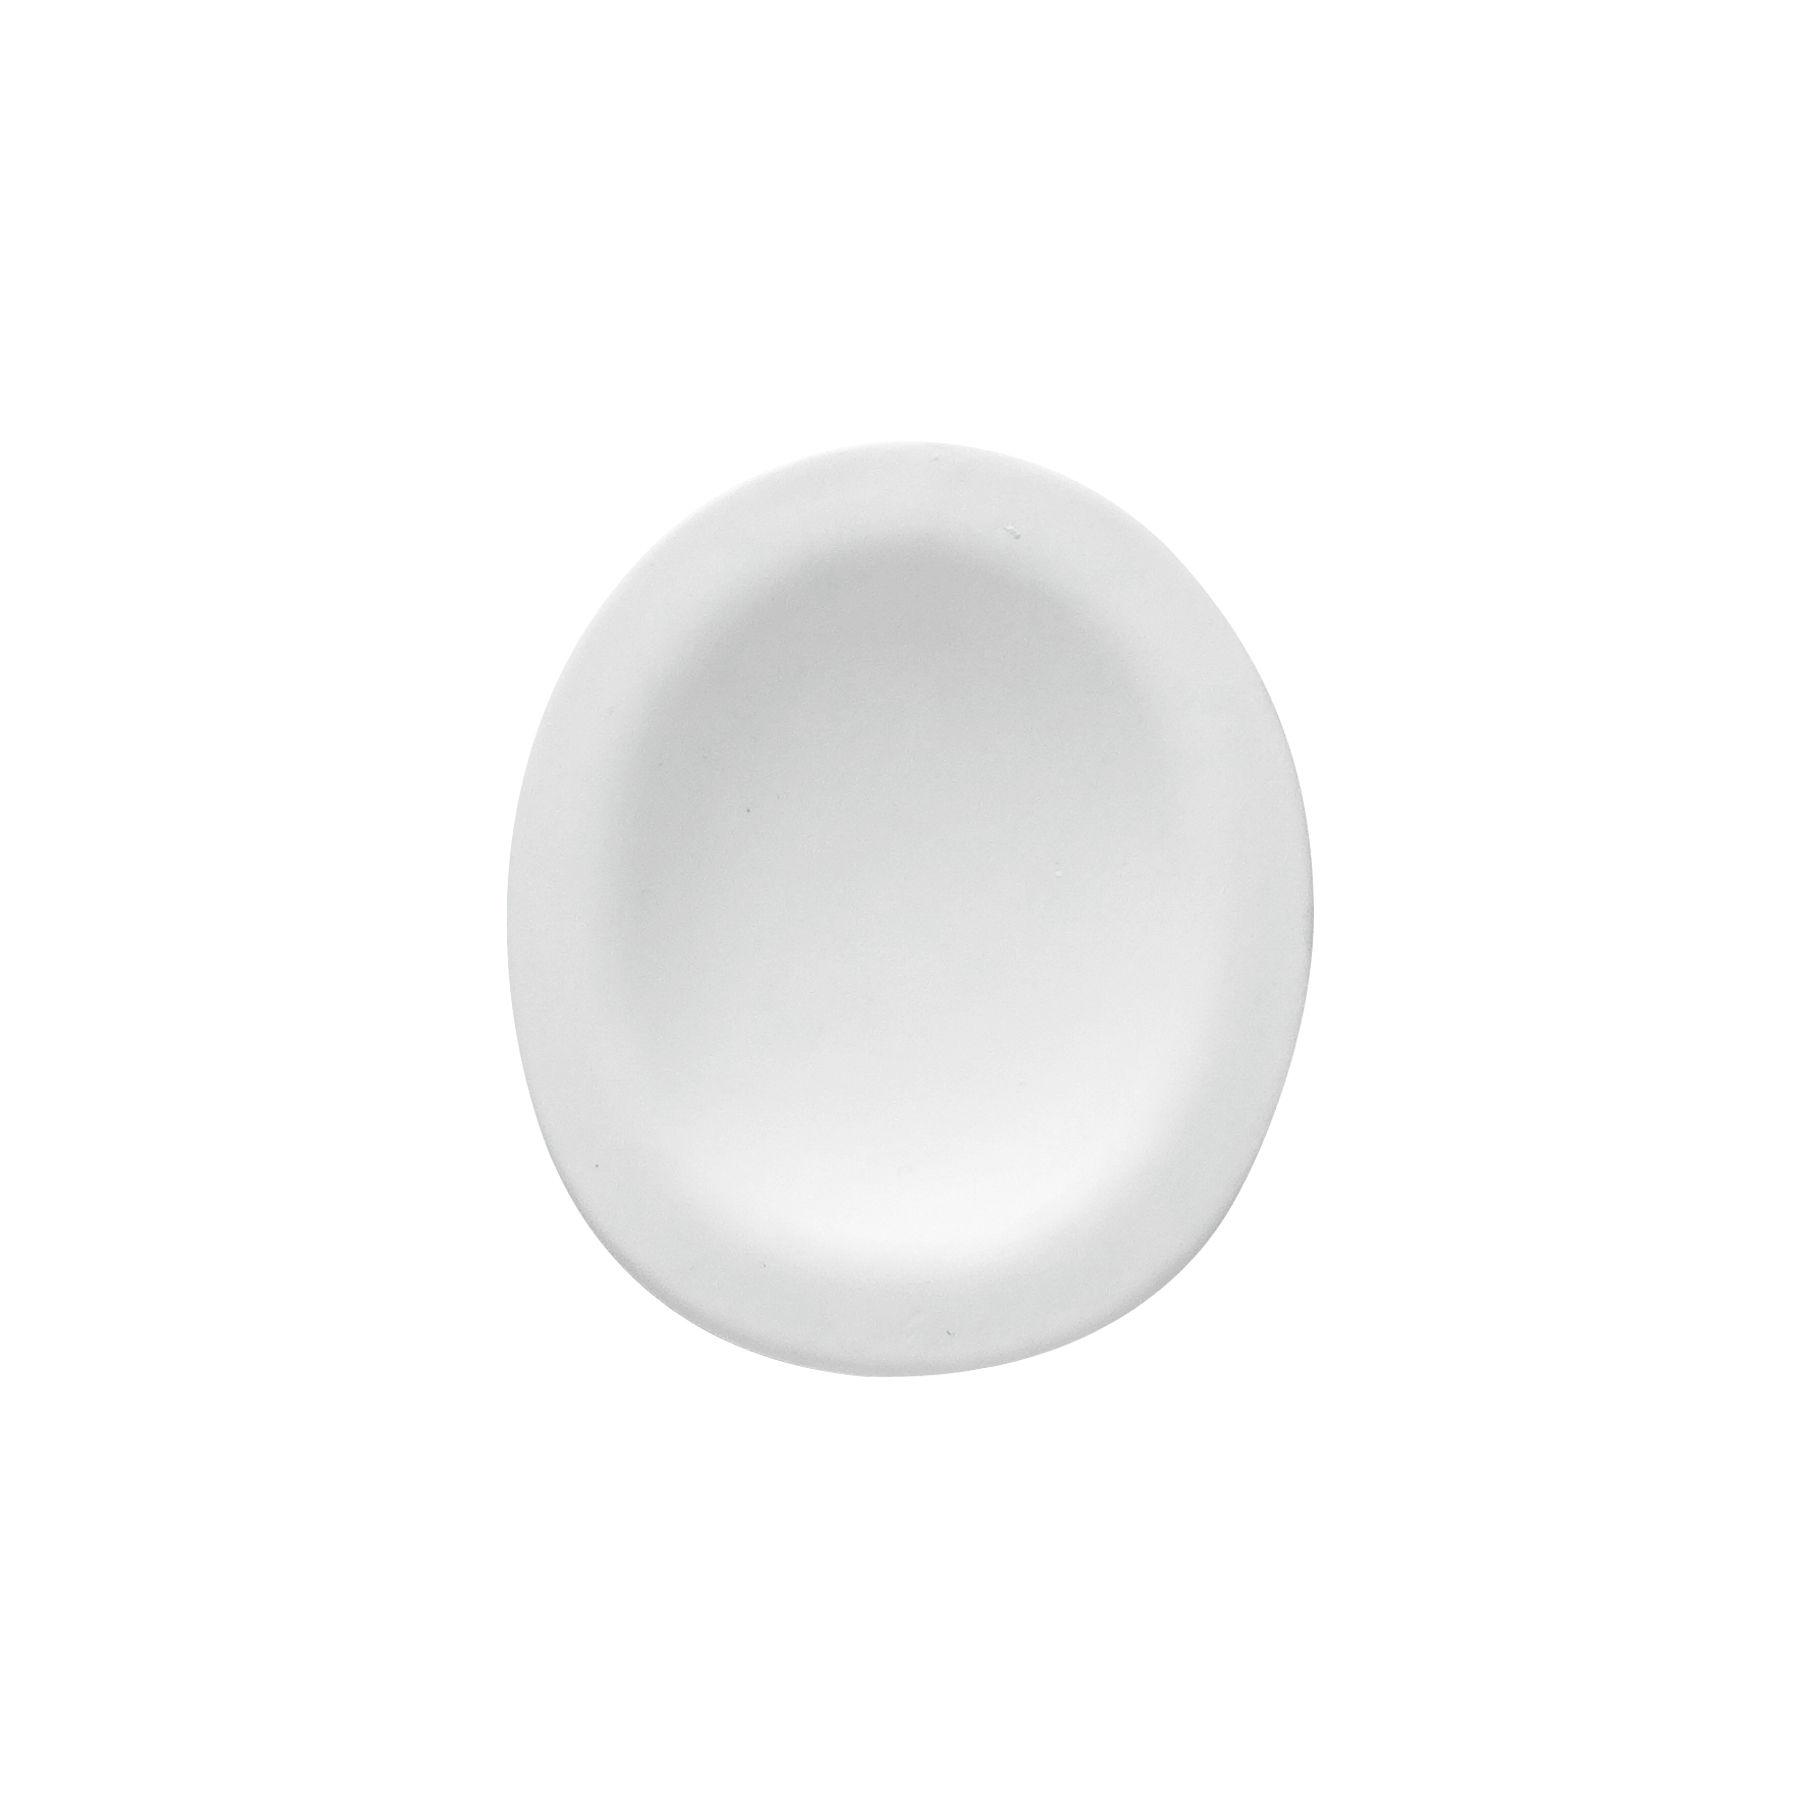 Tableware - Bowls - Jo 1 Small dish - 7 x 8 cm by cookplay - Matt white - Matt porcelain